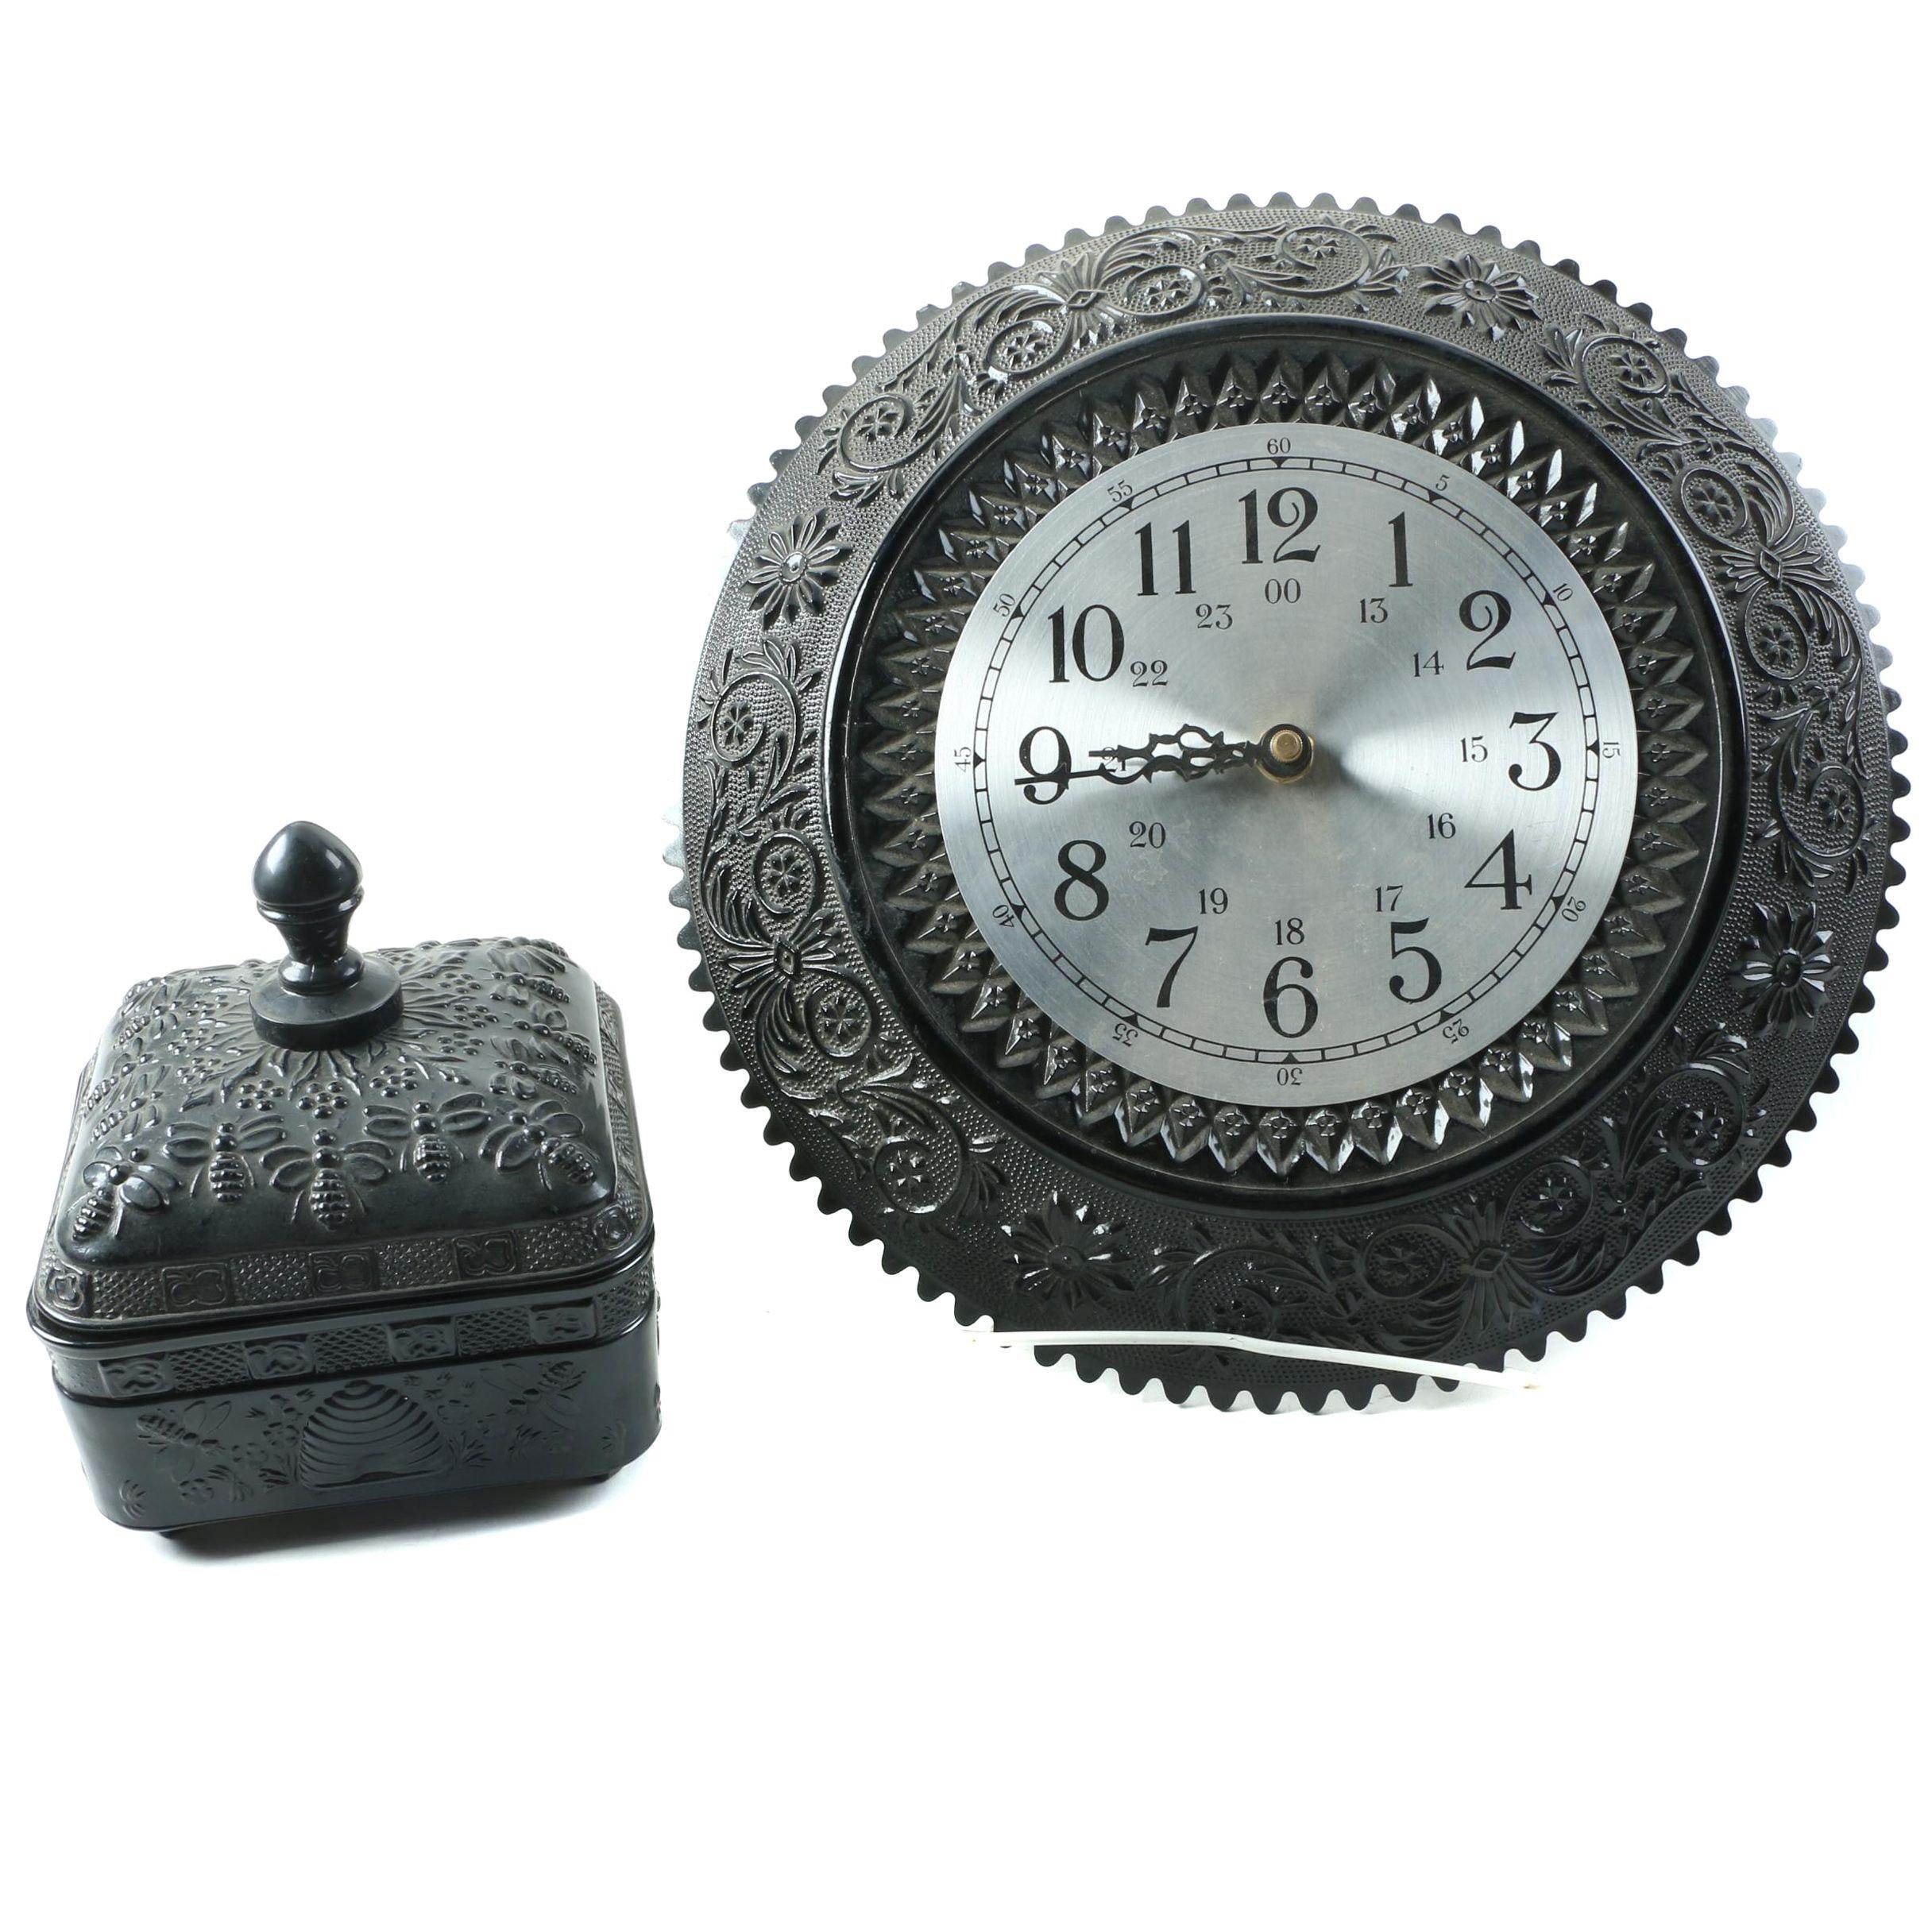 Decorative Glass Wall Clock and Box